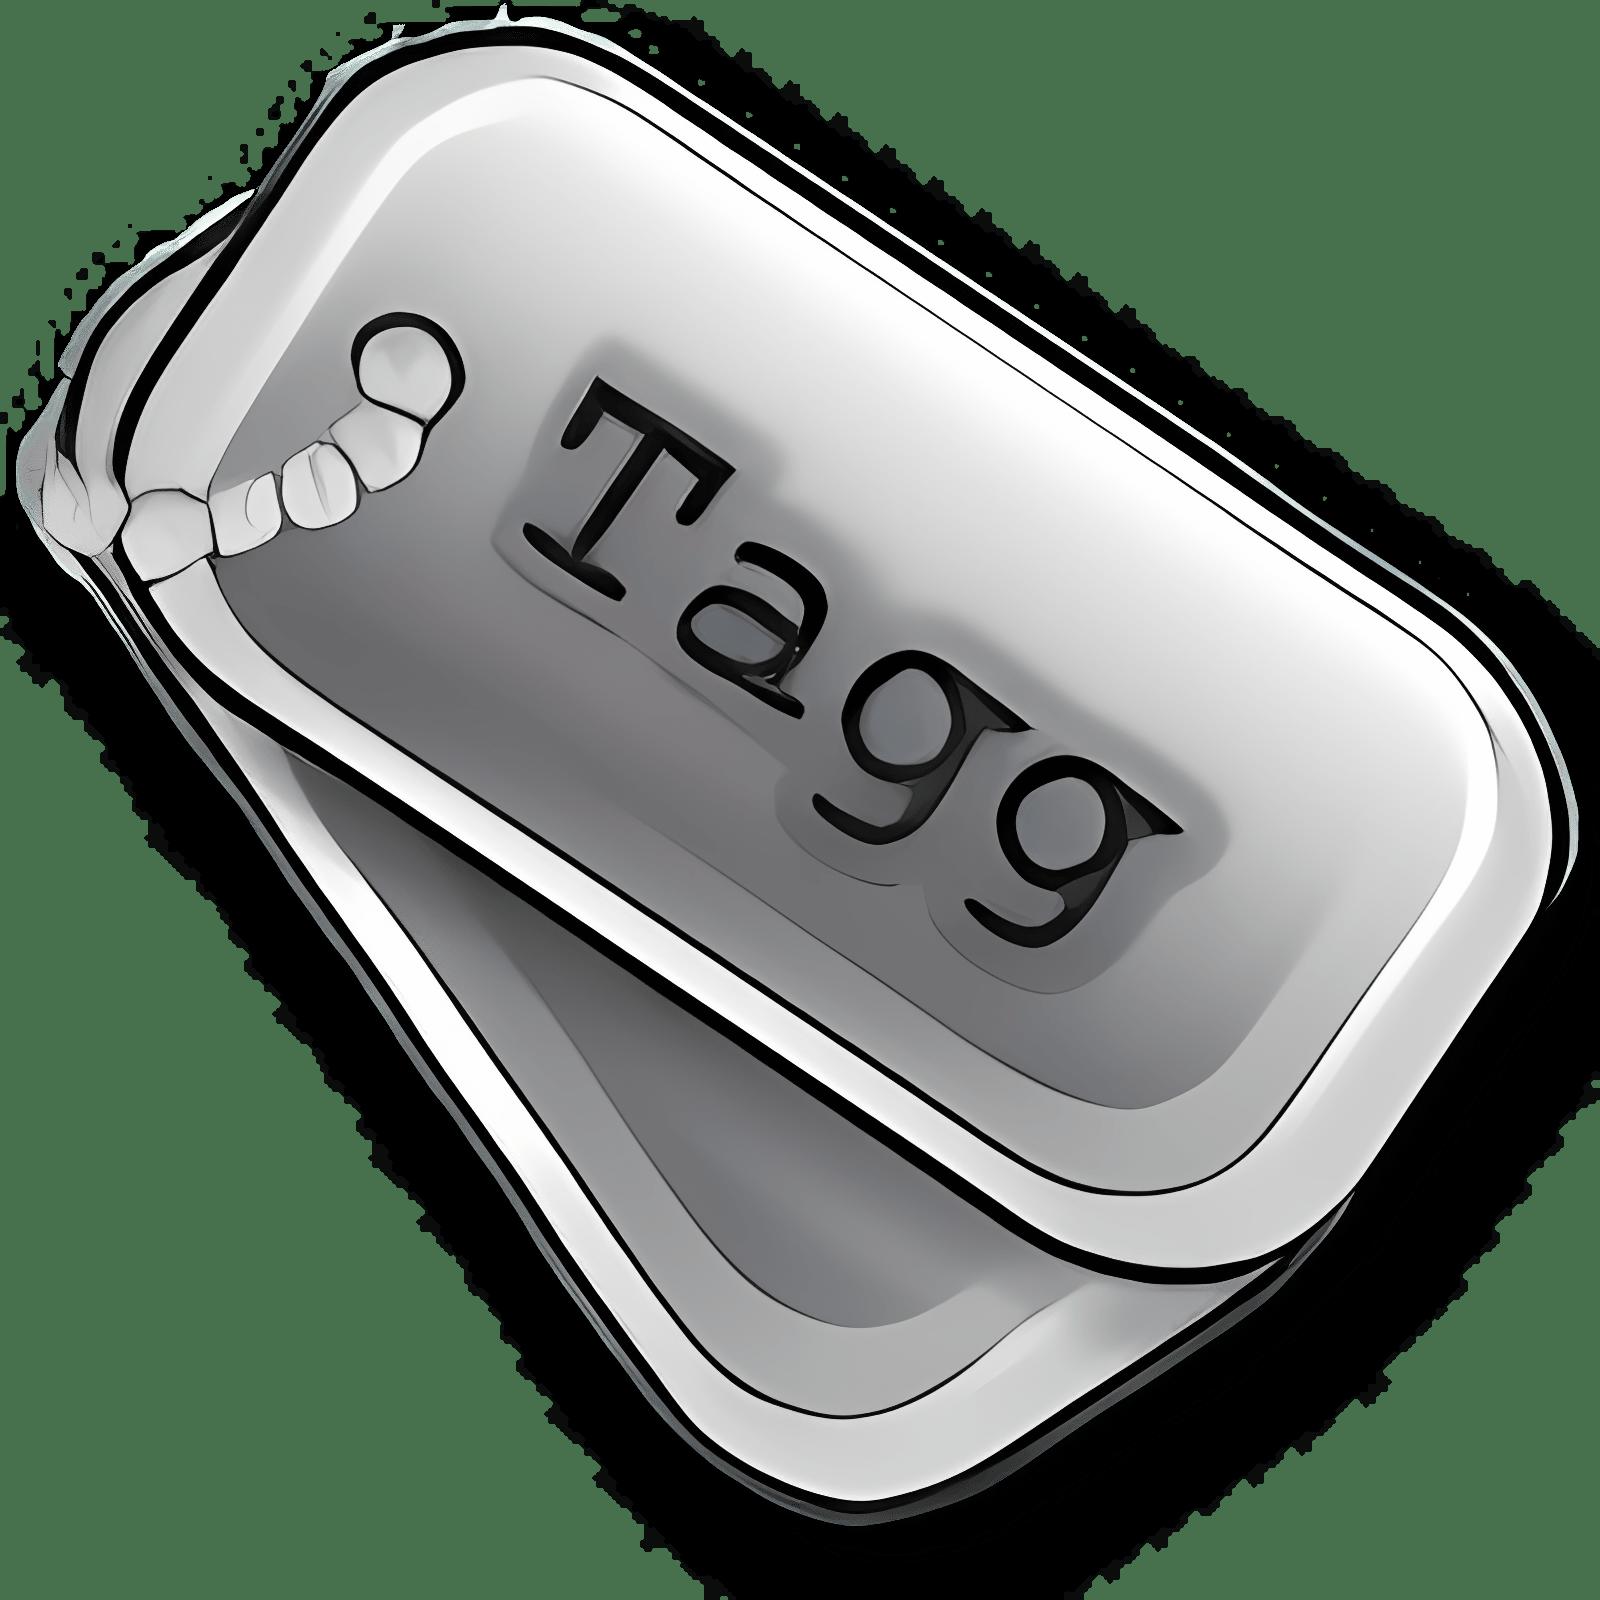 Tagg 2.0.2